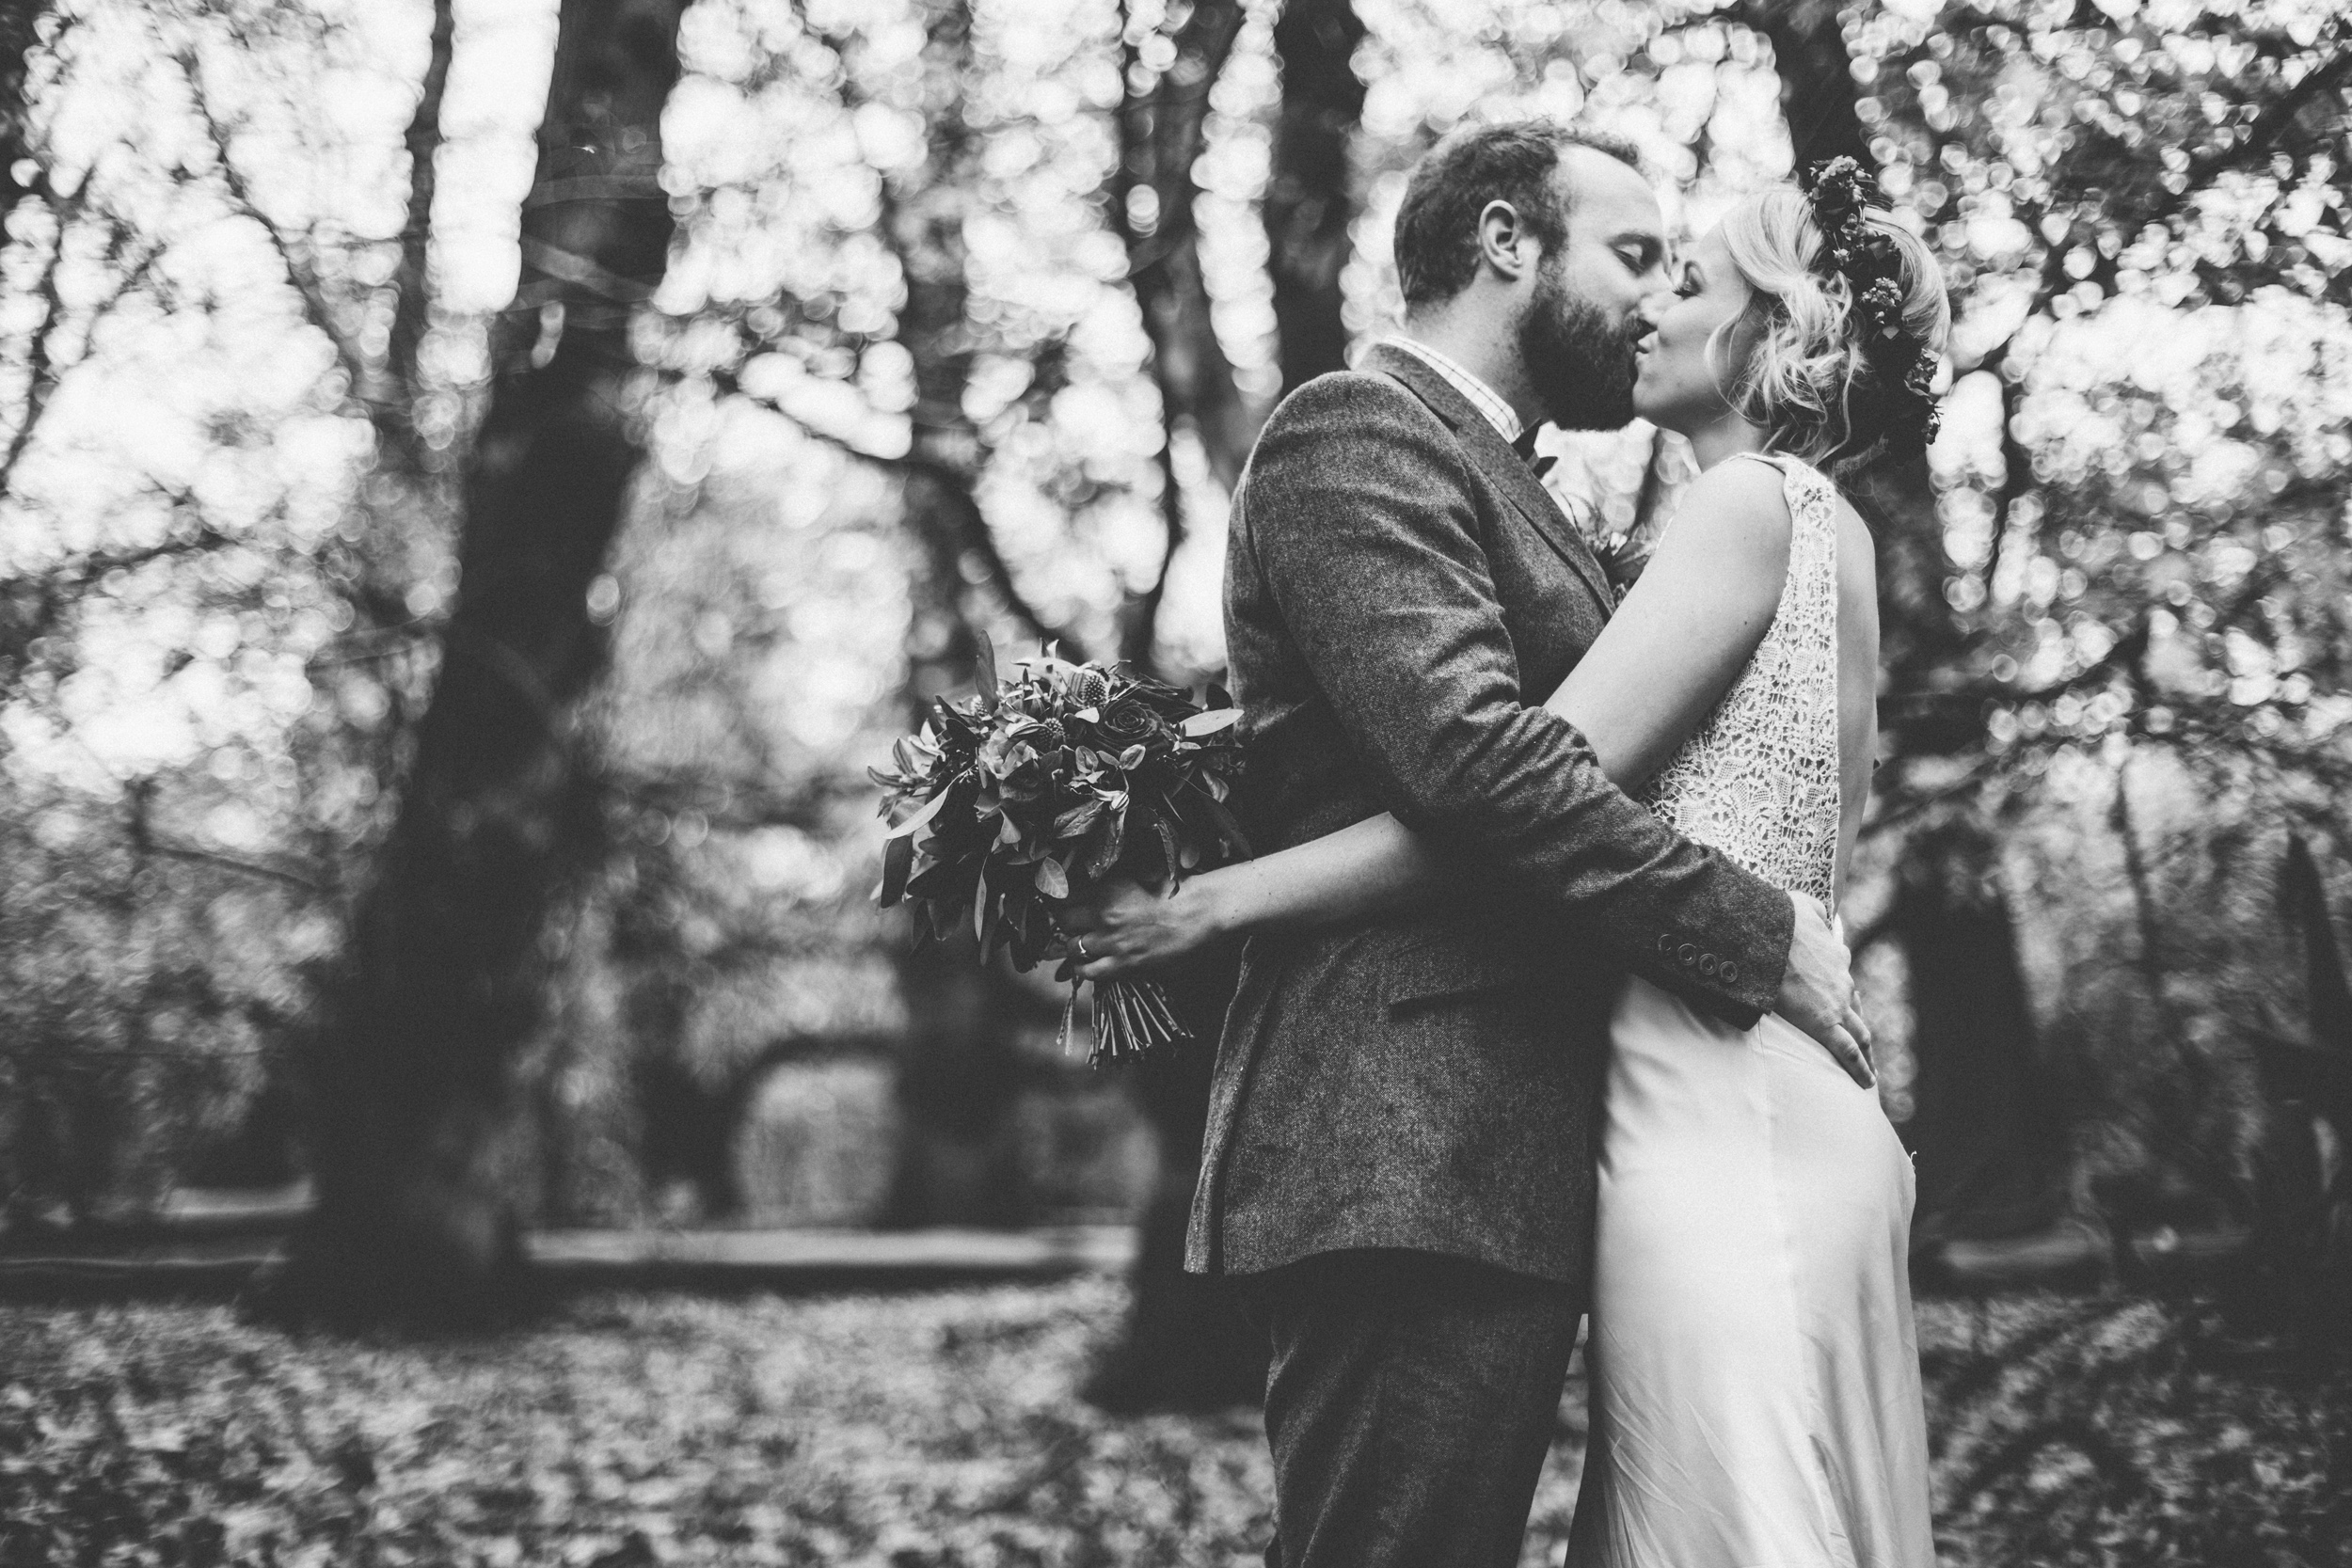 Kate-Beaumont-Wedding-Dresses-Autumn-Shoot-Rebecca-Tovey-3.jpg